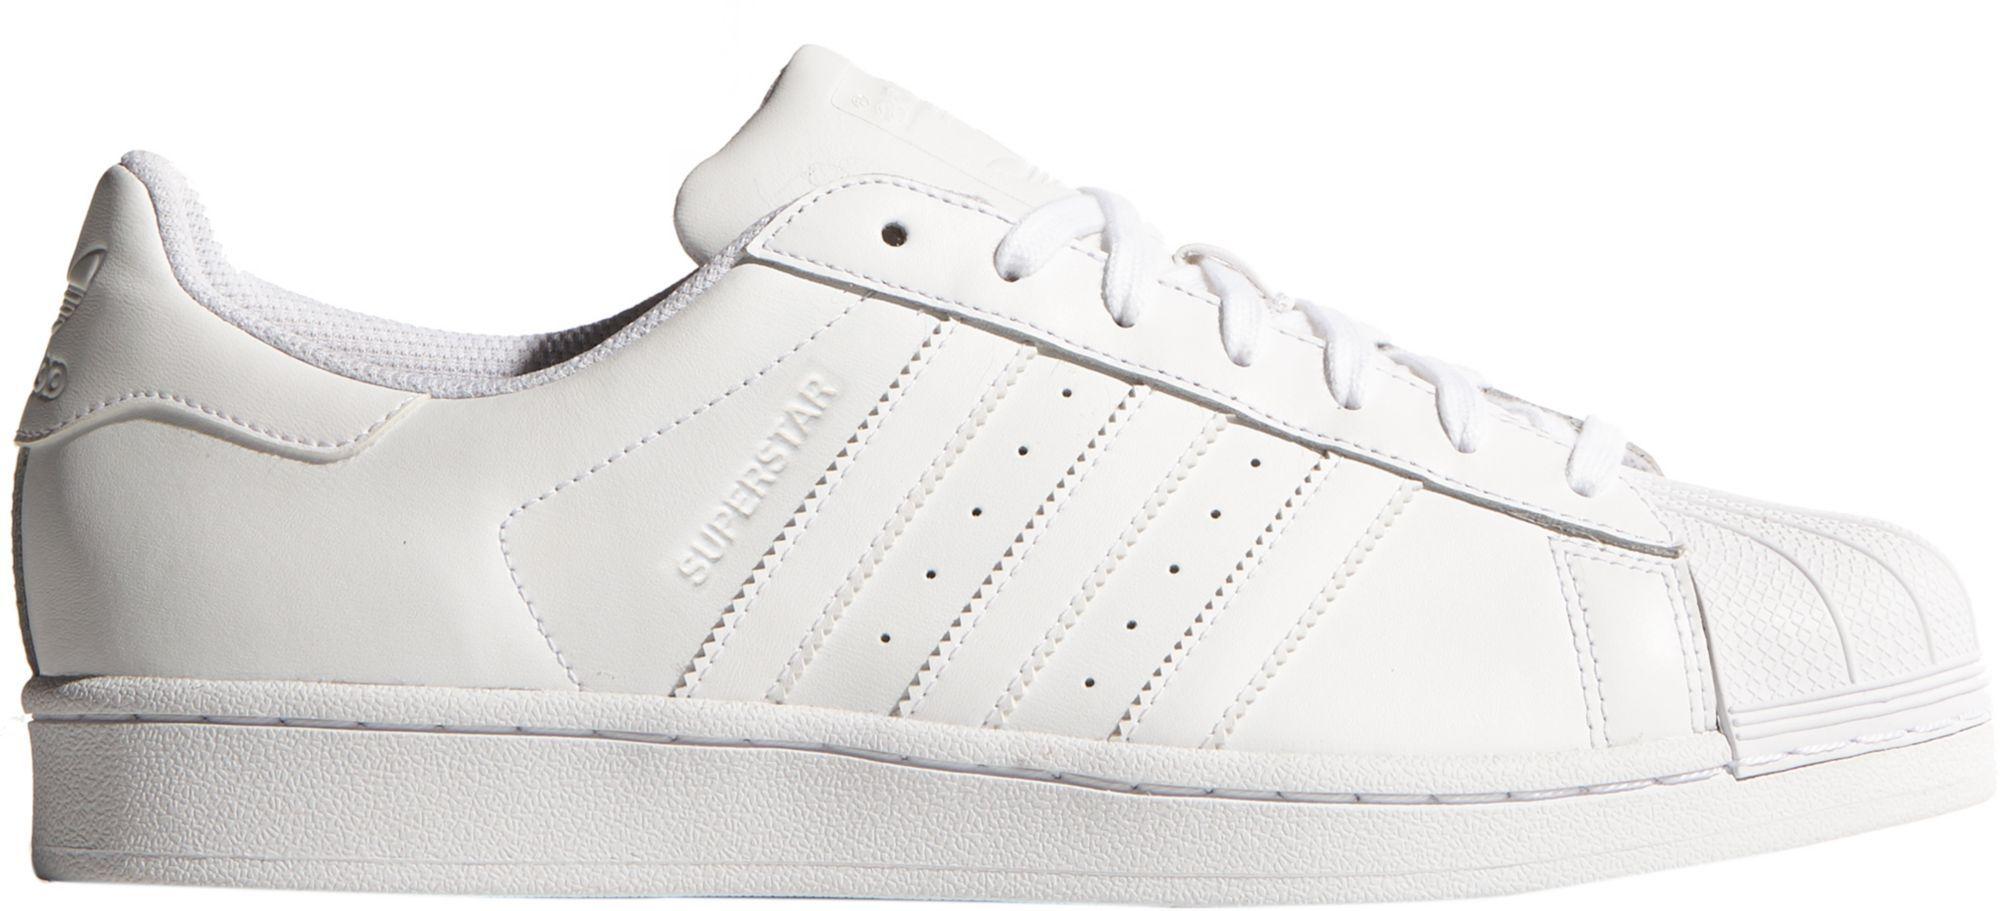 timeless design 25b9d 9817a adidas Originals Men's Superstar Shoes, Size: 8.0, White ...